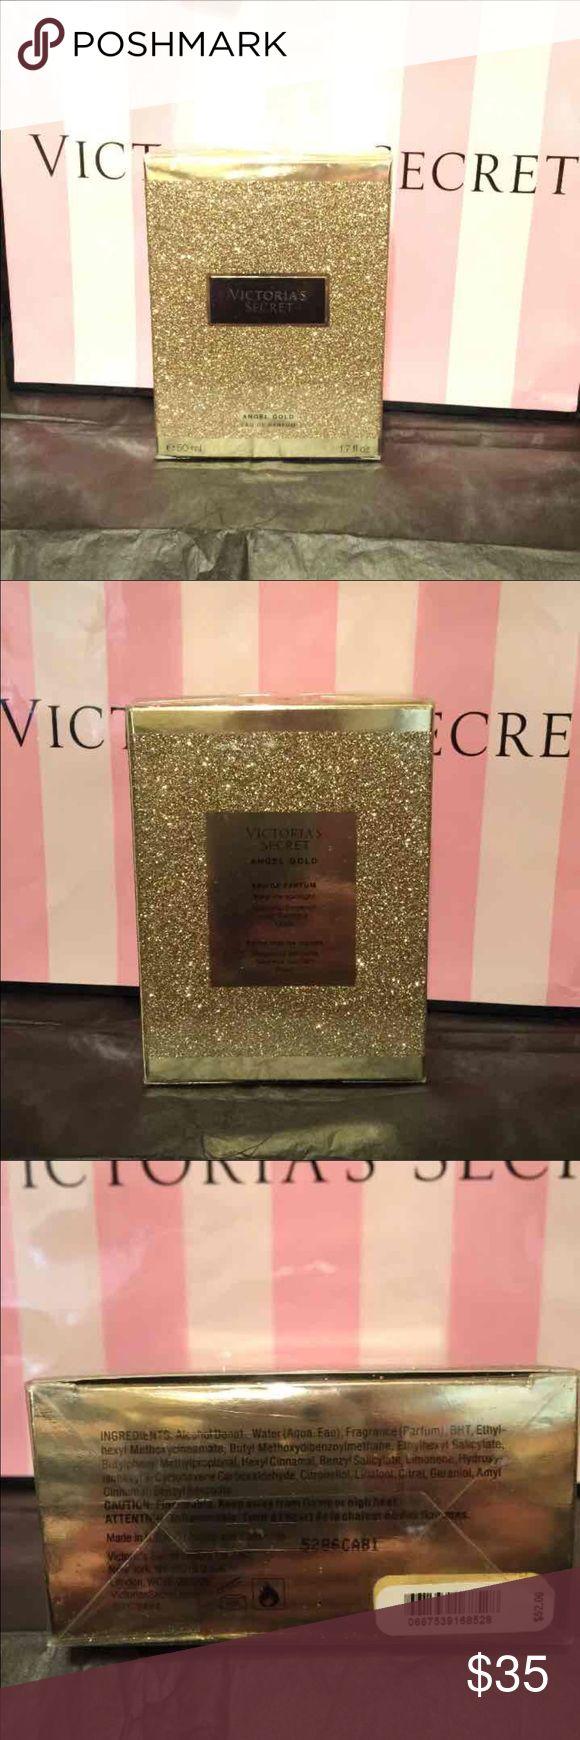 Victoria's Secret Perfume Victoria's Secret Parfum. Scent is Angel Gold. 50 ml... 1.7 oz bottle. Never been used, still in original unopened box. Victoria's Secret Other